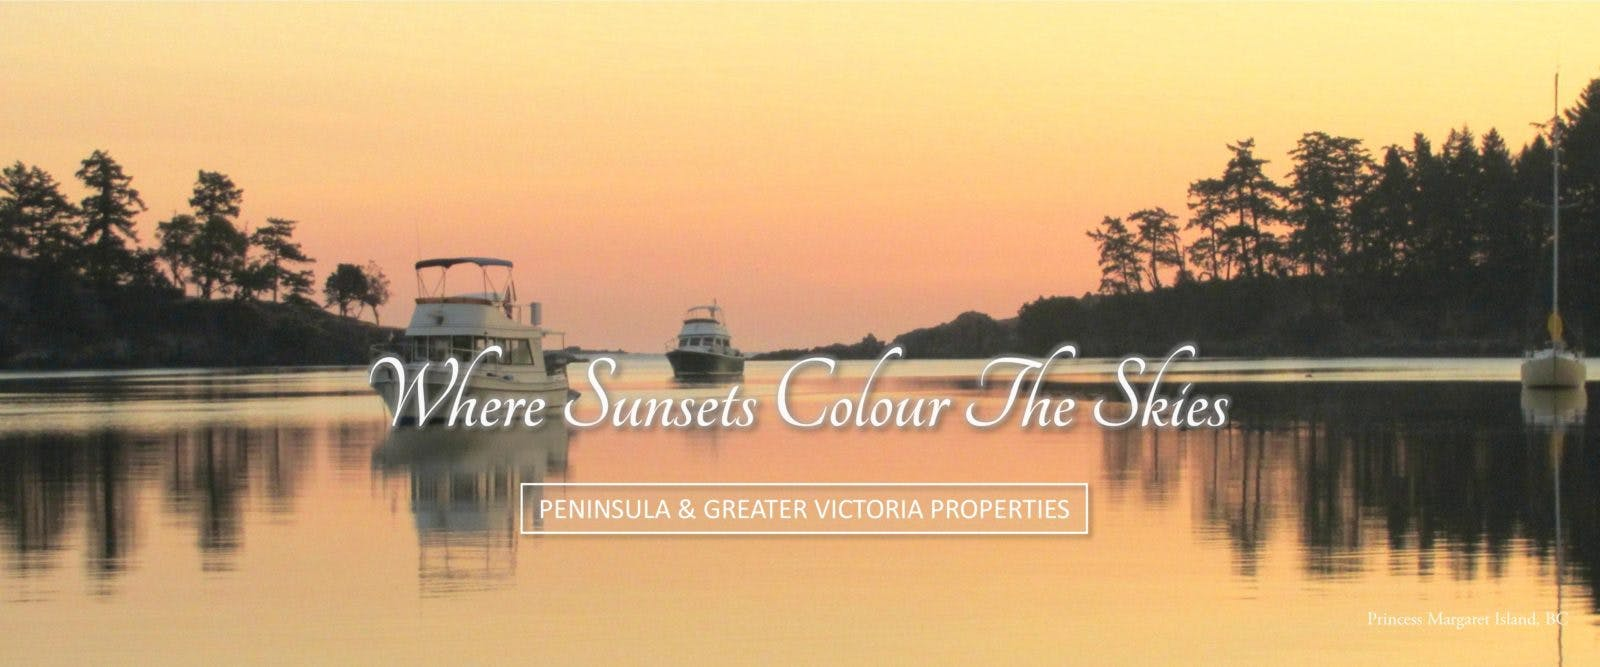 Pacifica Real Estate Inc. – Princess Margaret Island BC